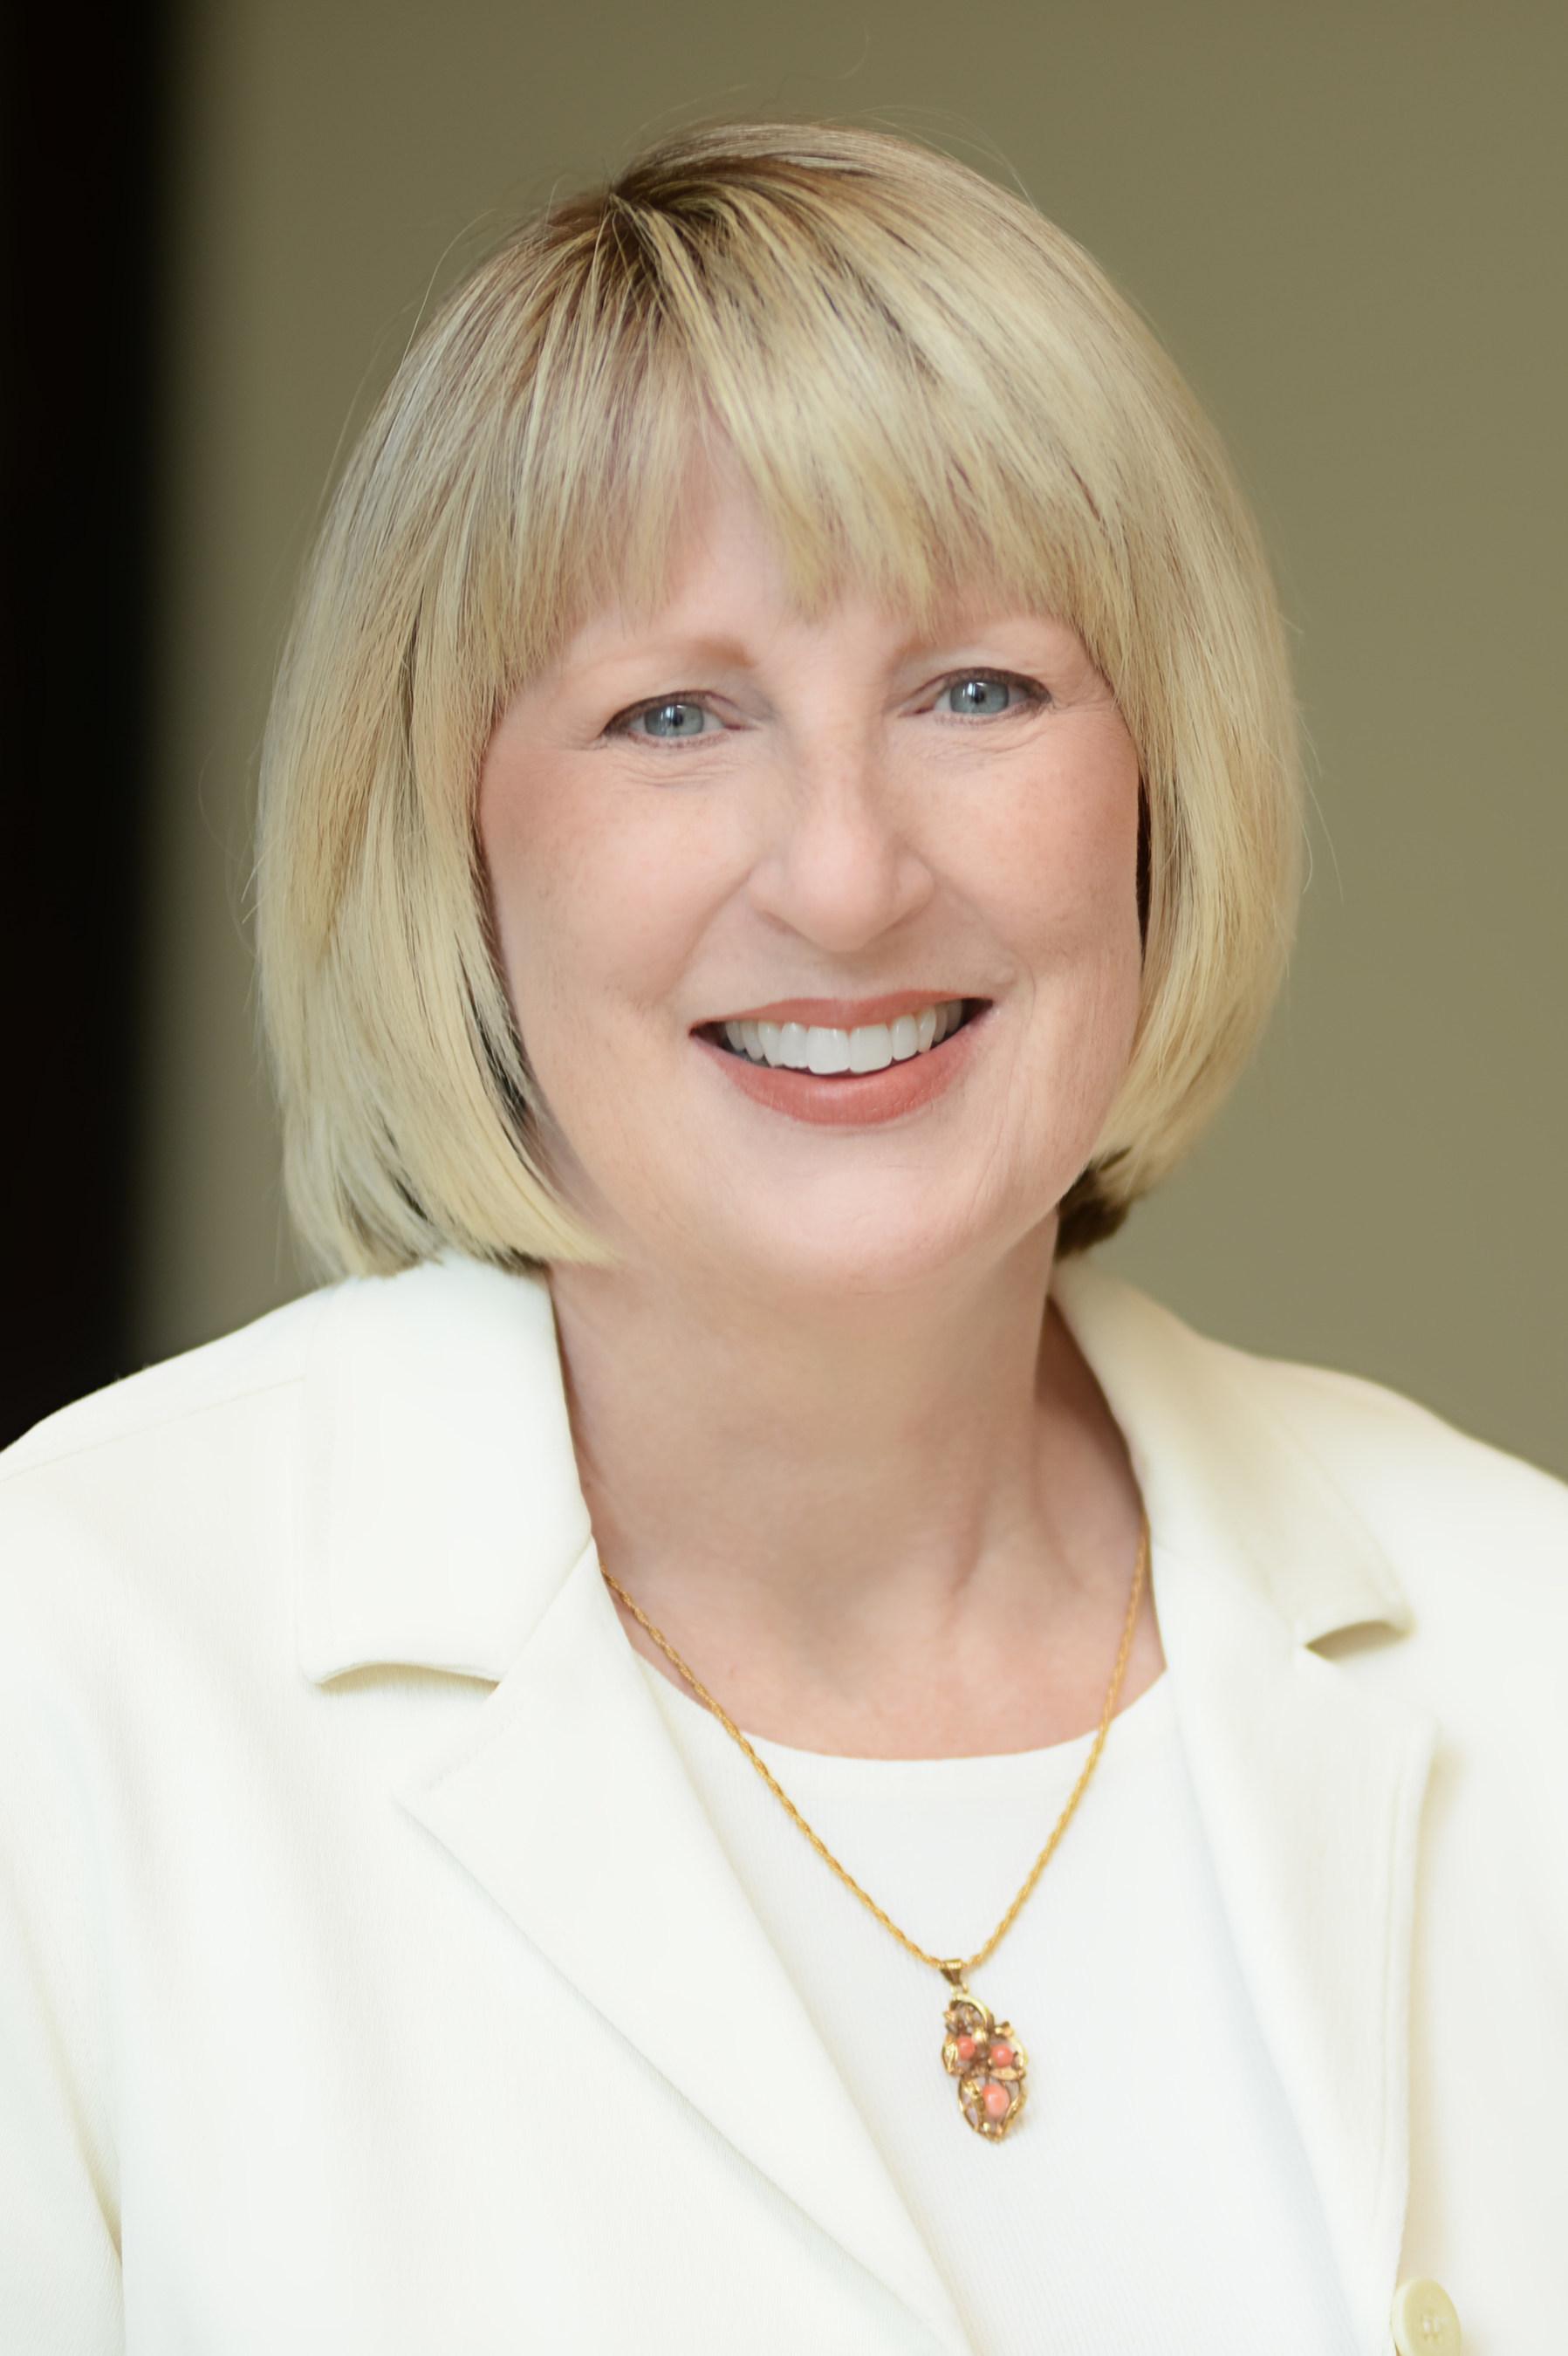 Pat Hanford, CFRE, Development Director, Monique Burr Foundation for Children